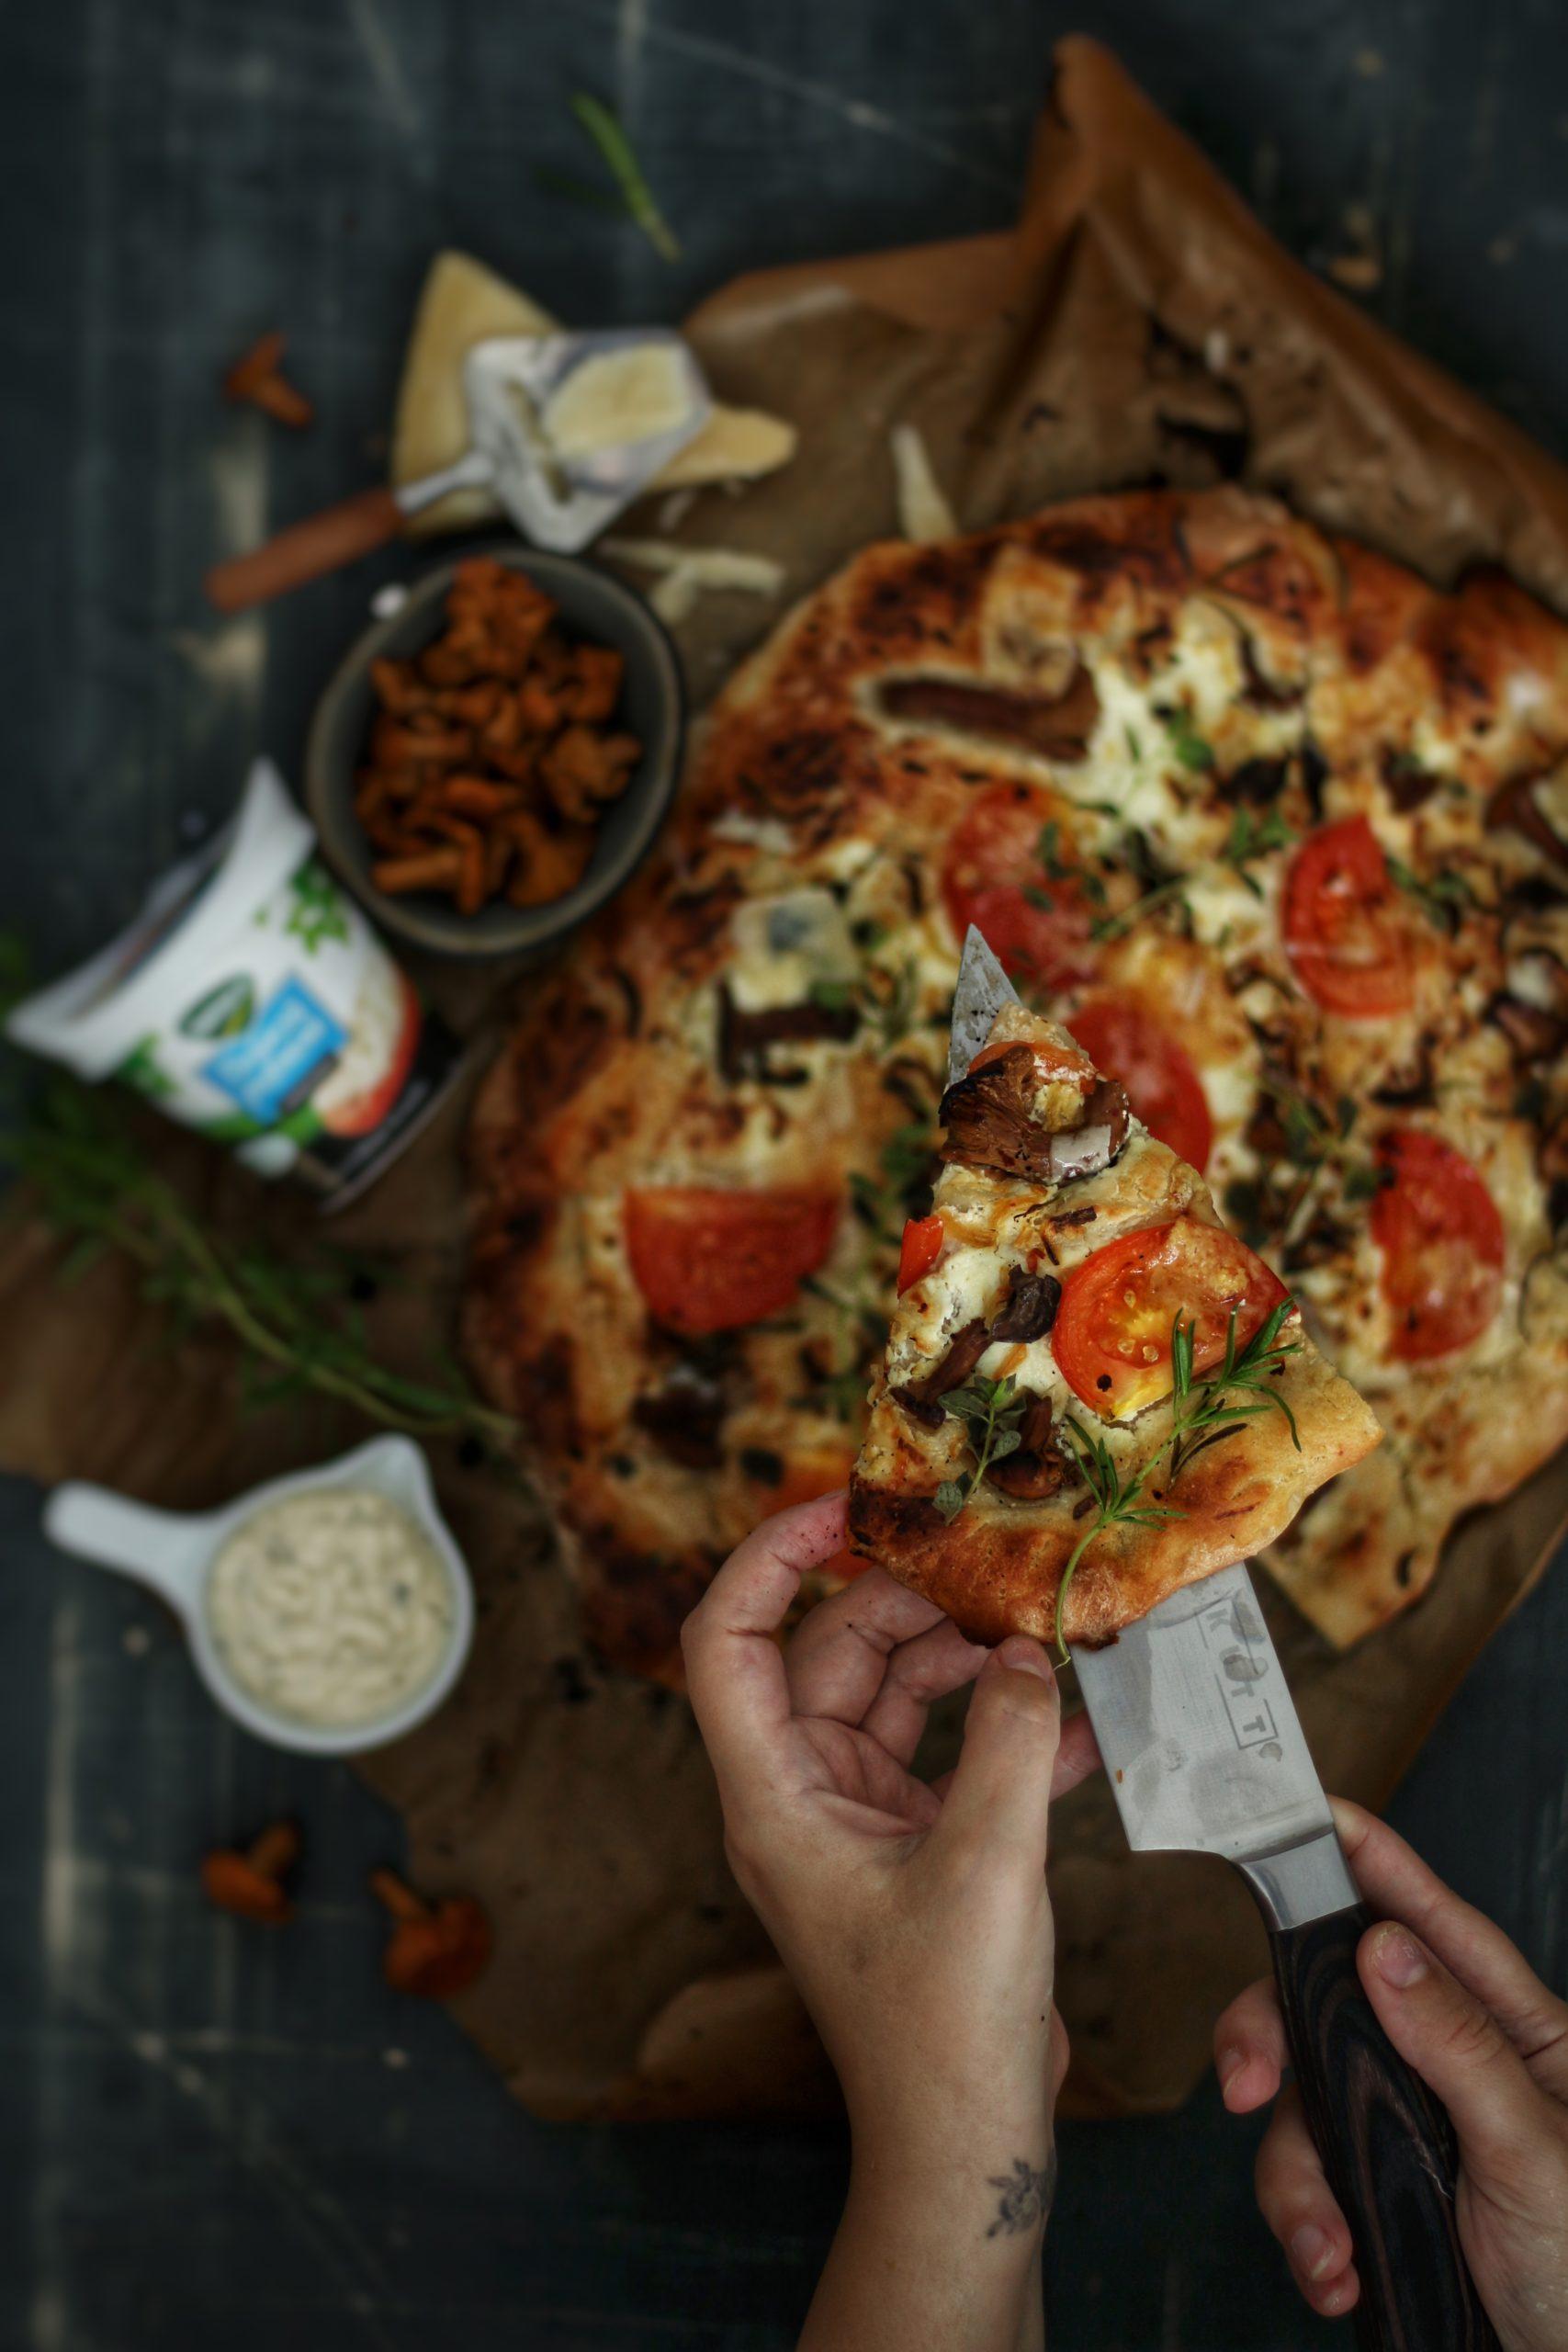 Pizza cu crema de branza, galbiori si rozmarin